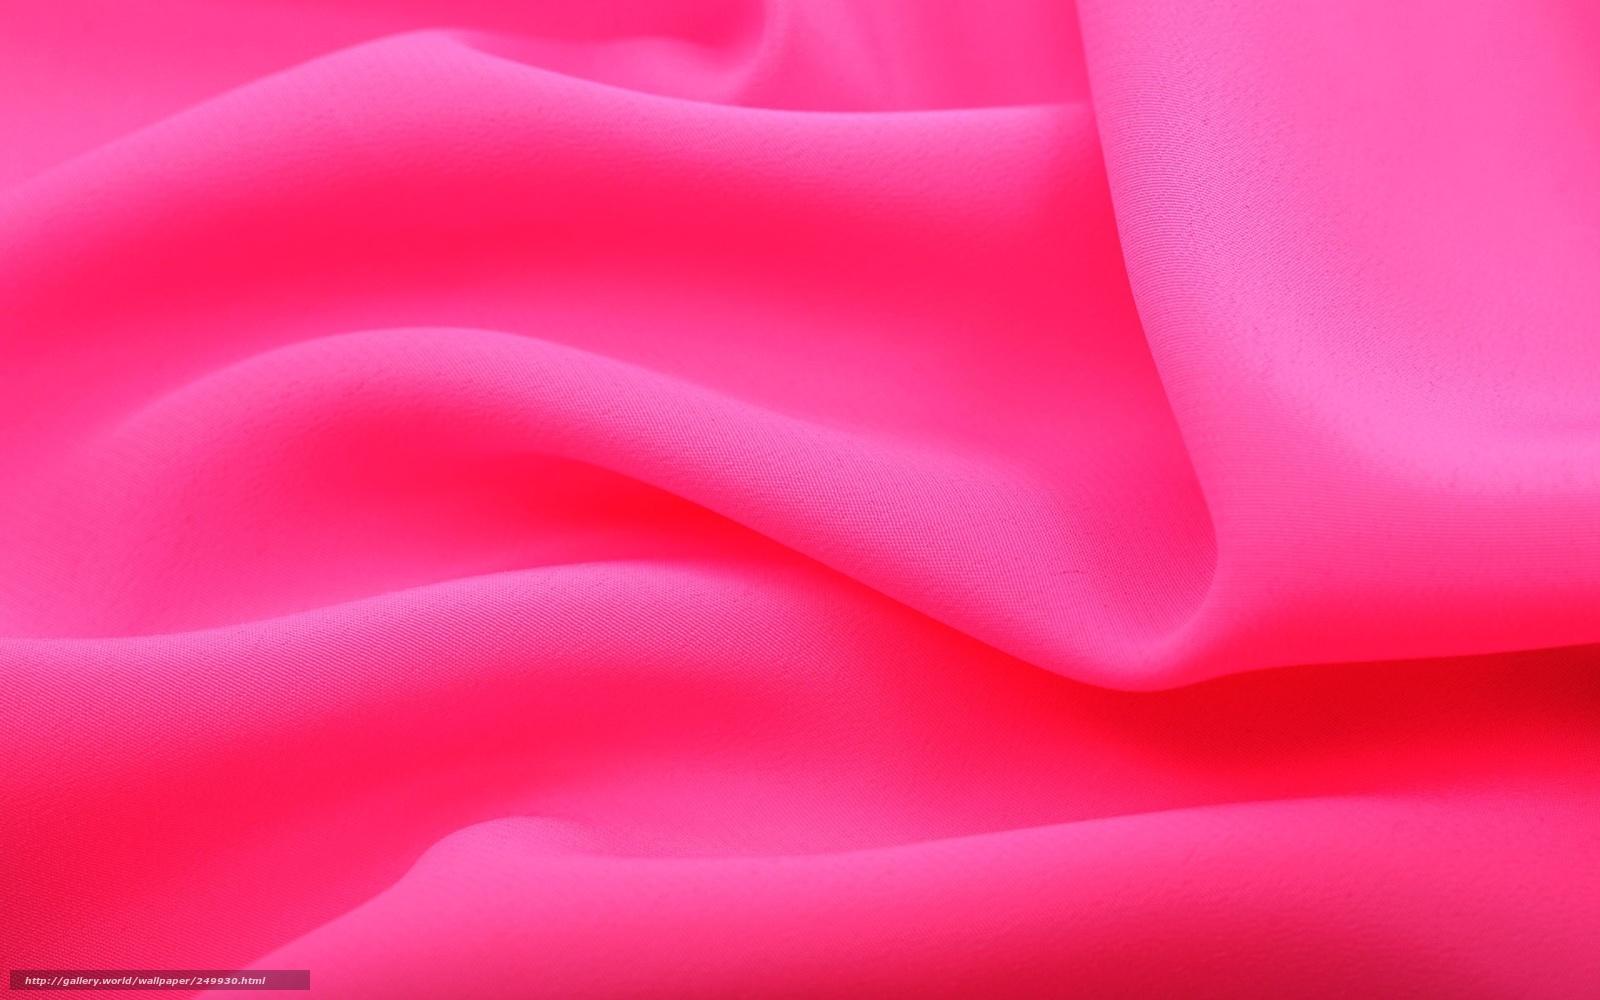 Hq vzor, tkaniny, růžová, makro, 1920x1200 obrázek / textury